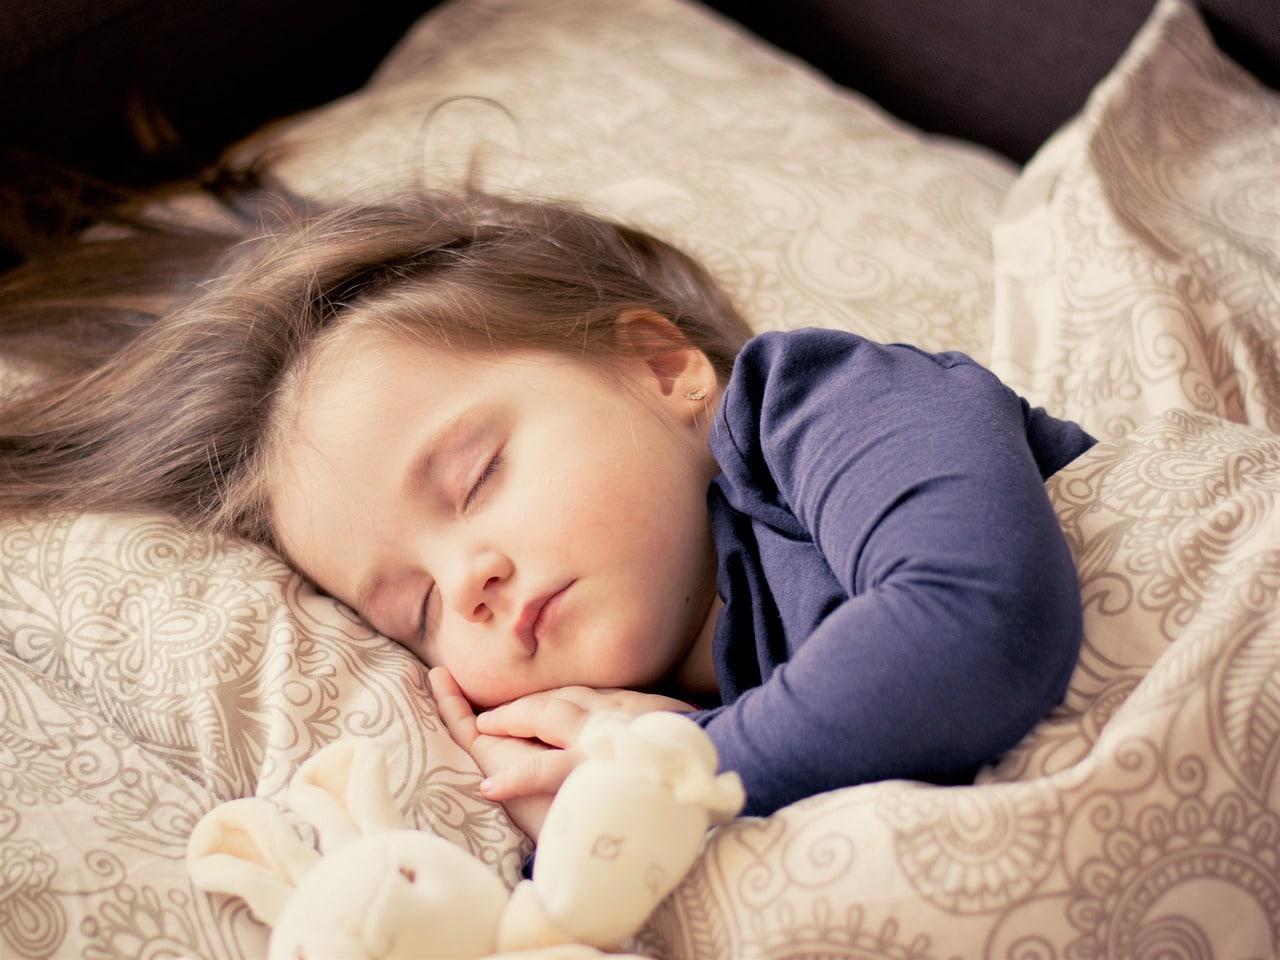 Kid sleeping peacefully